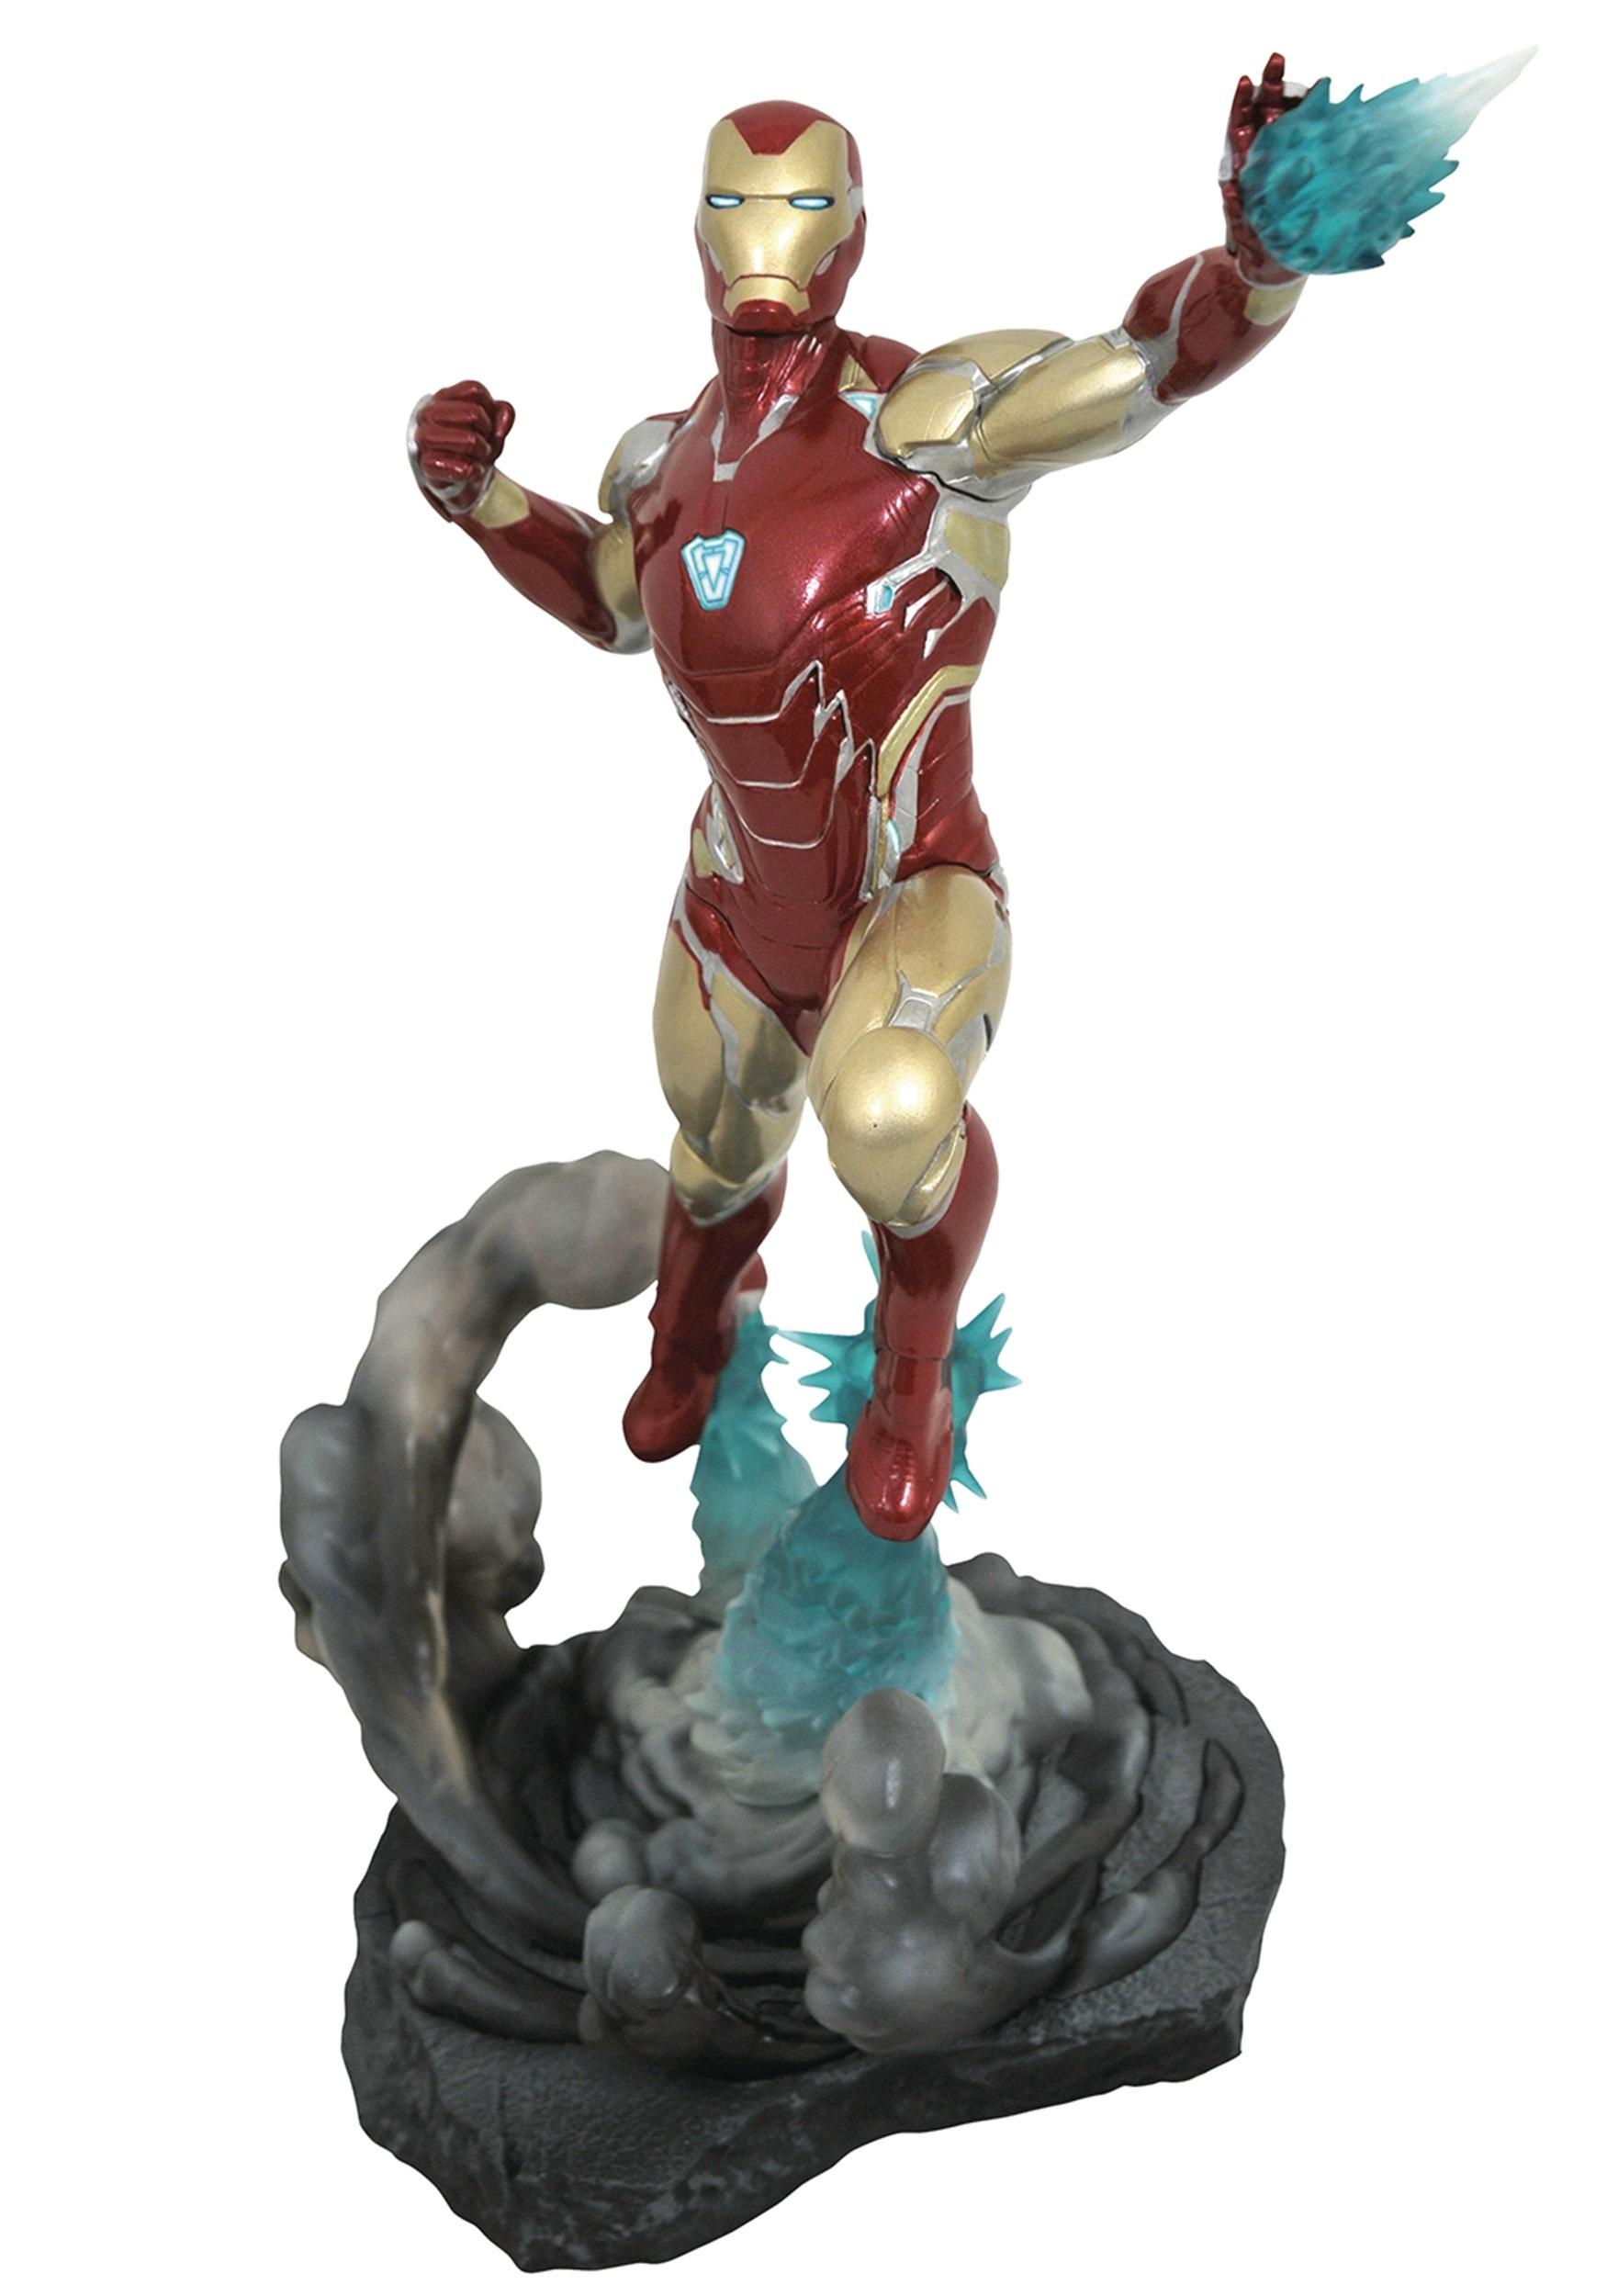 iron marvel endgame avengers mk85 pvc figurine figure